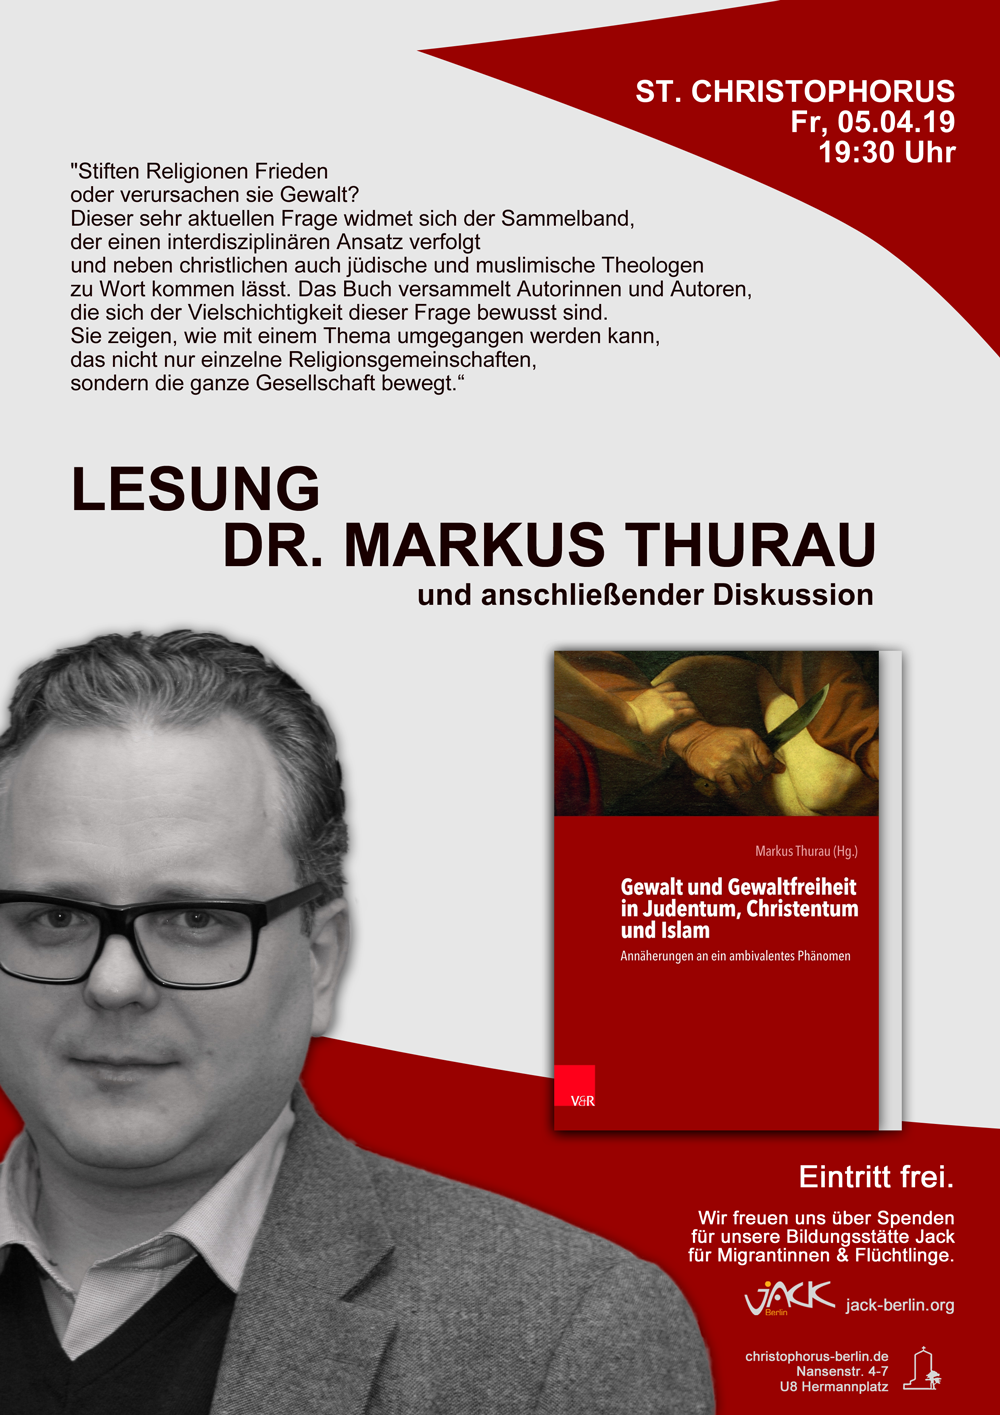 Lesung Markus Thurau @ St. Christophorus | Berlin | Berlin | Deutschland